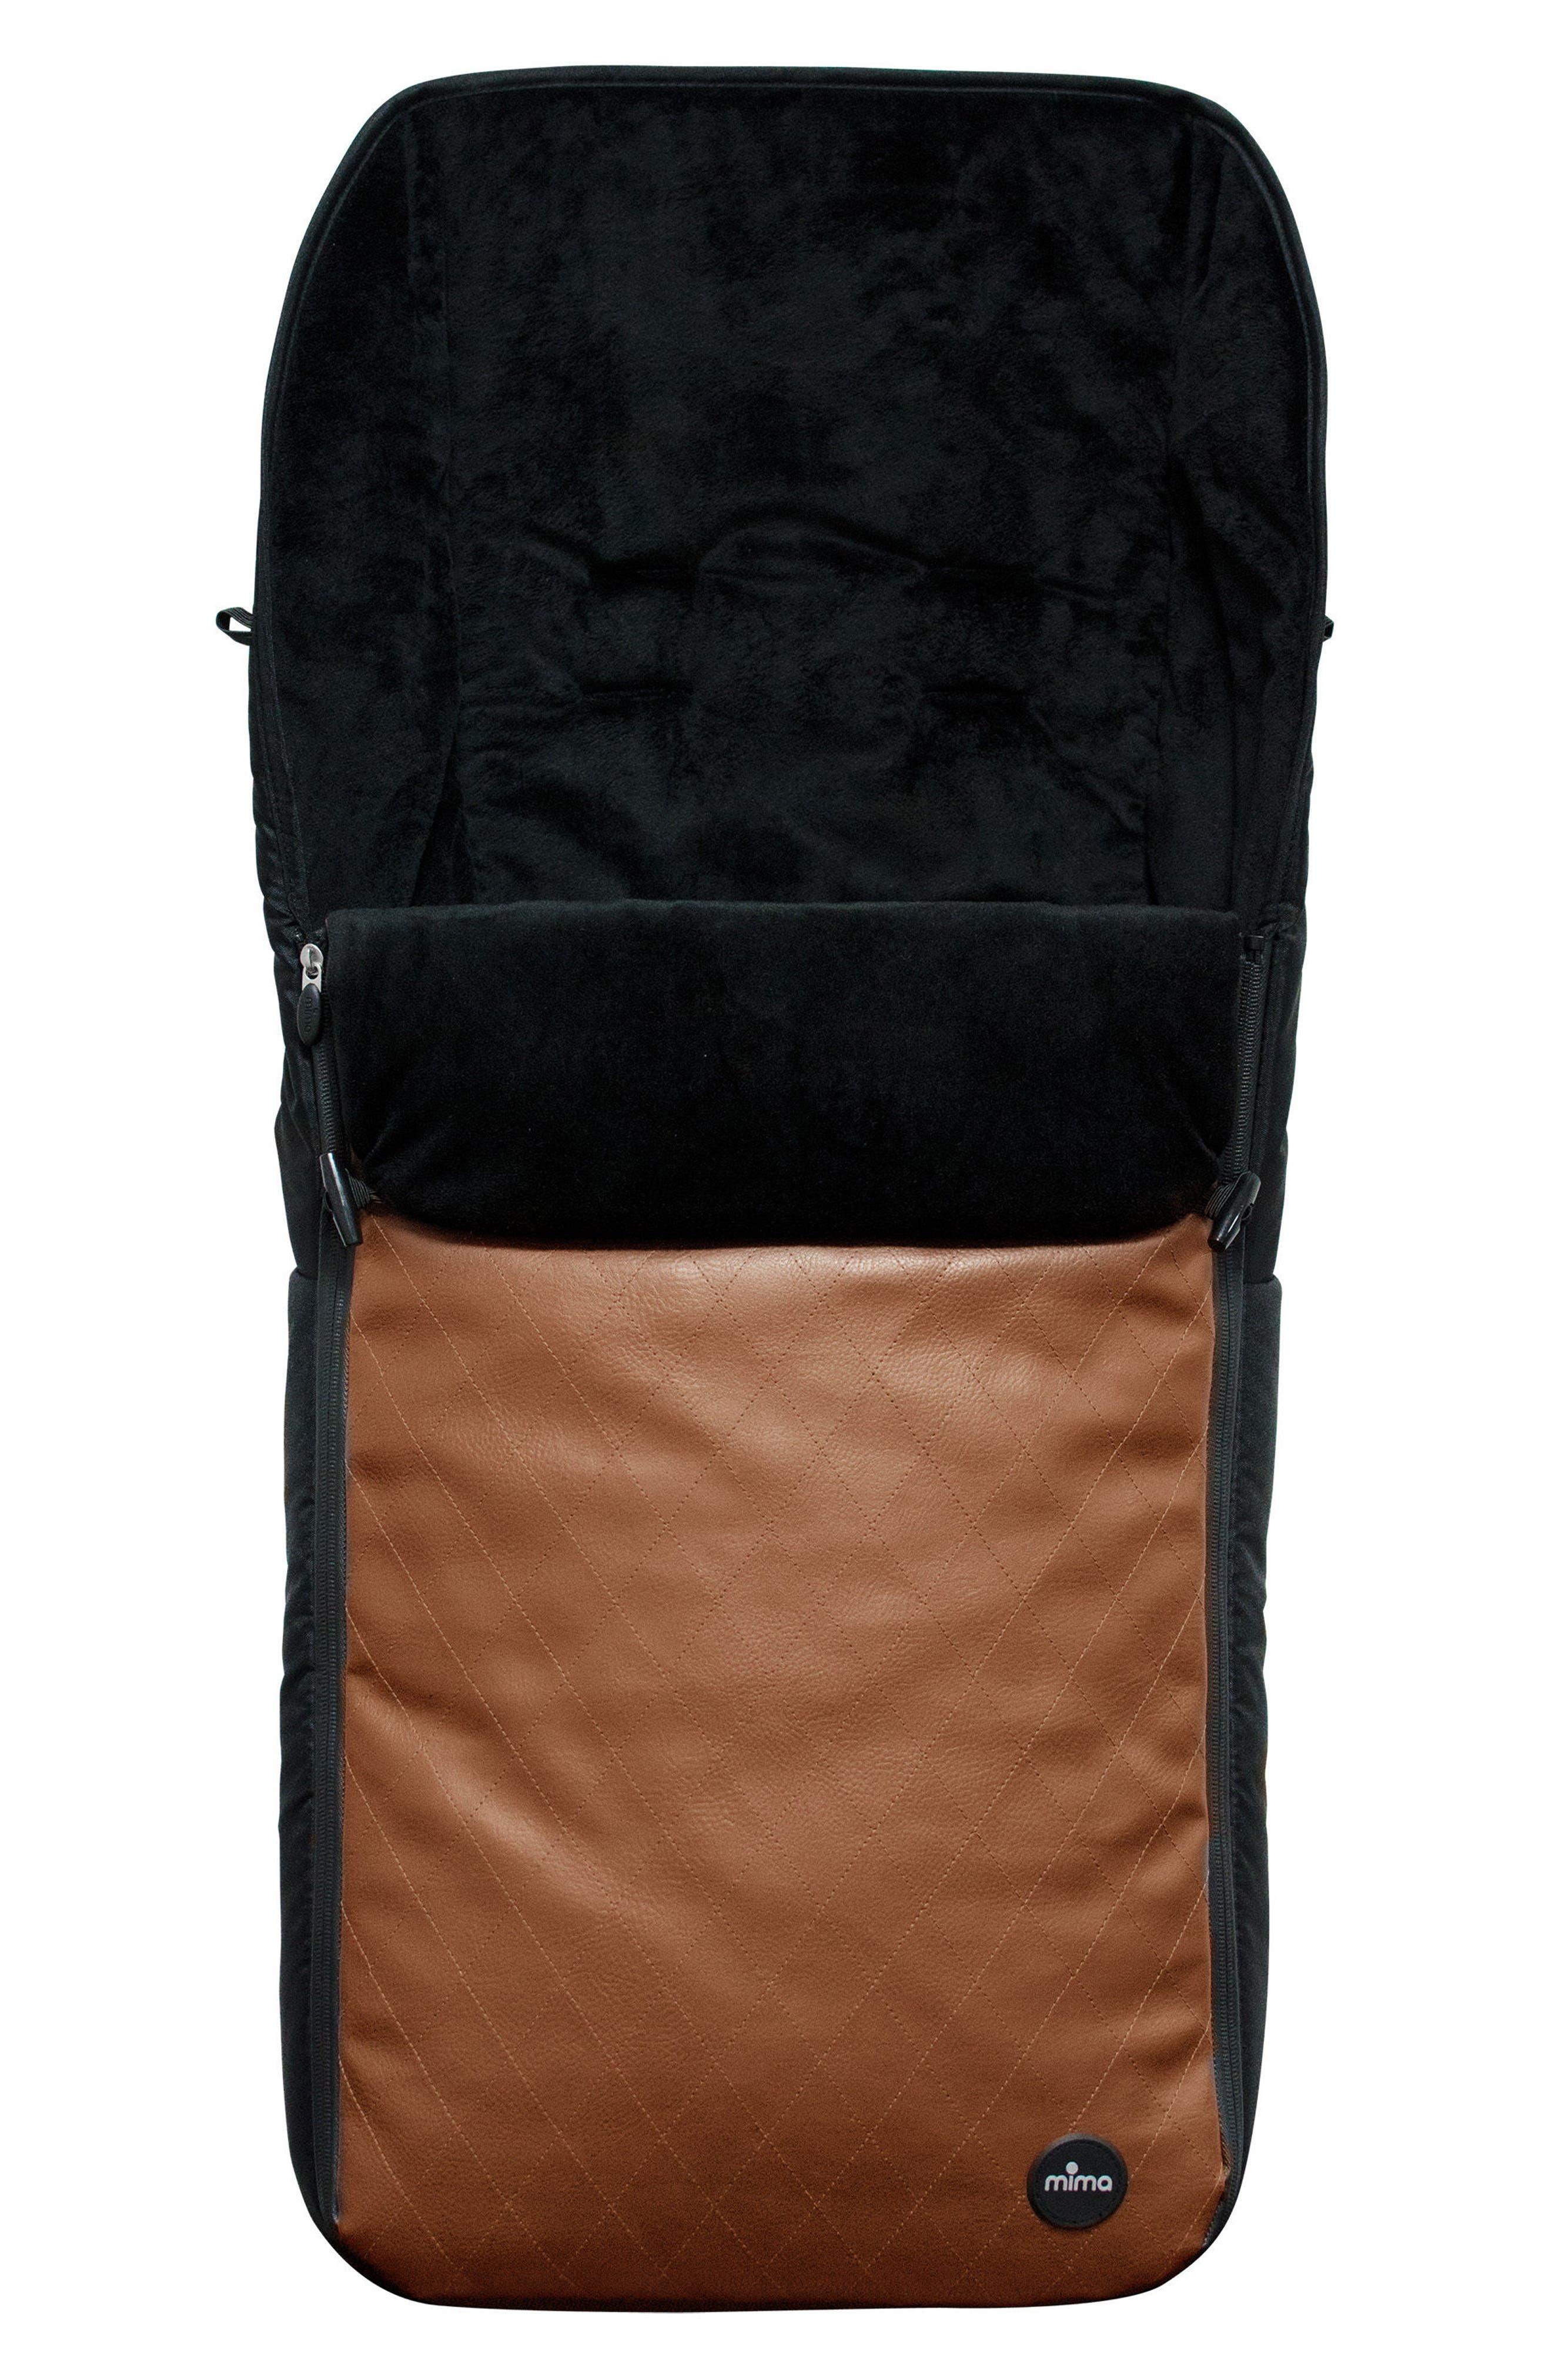 Faux Leather Footmuff,                         Main,                         color, Camel